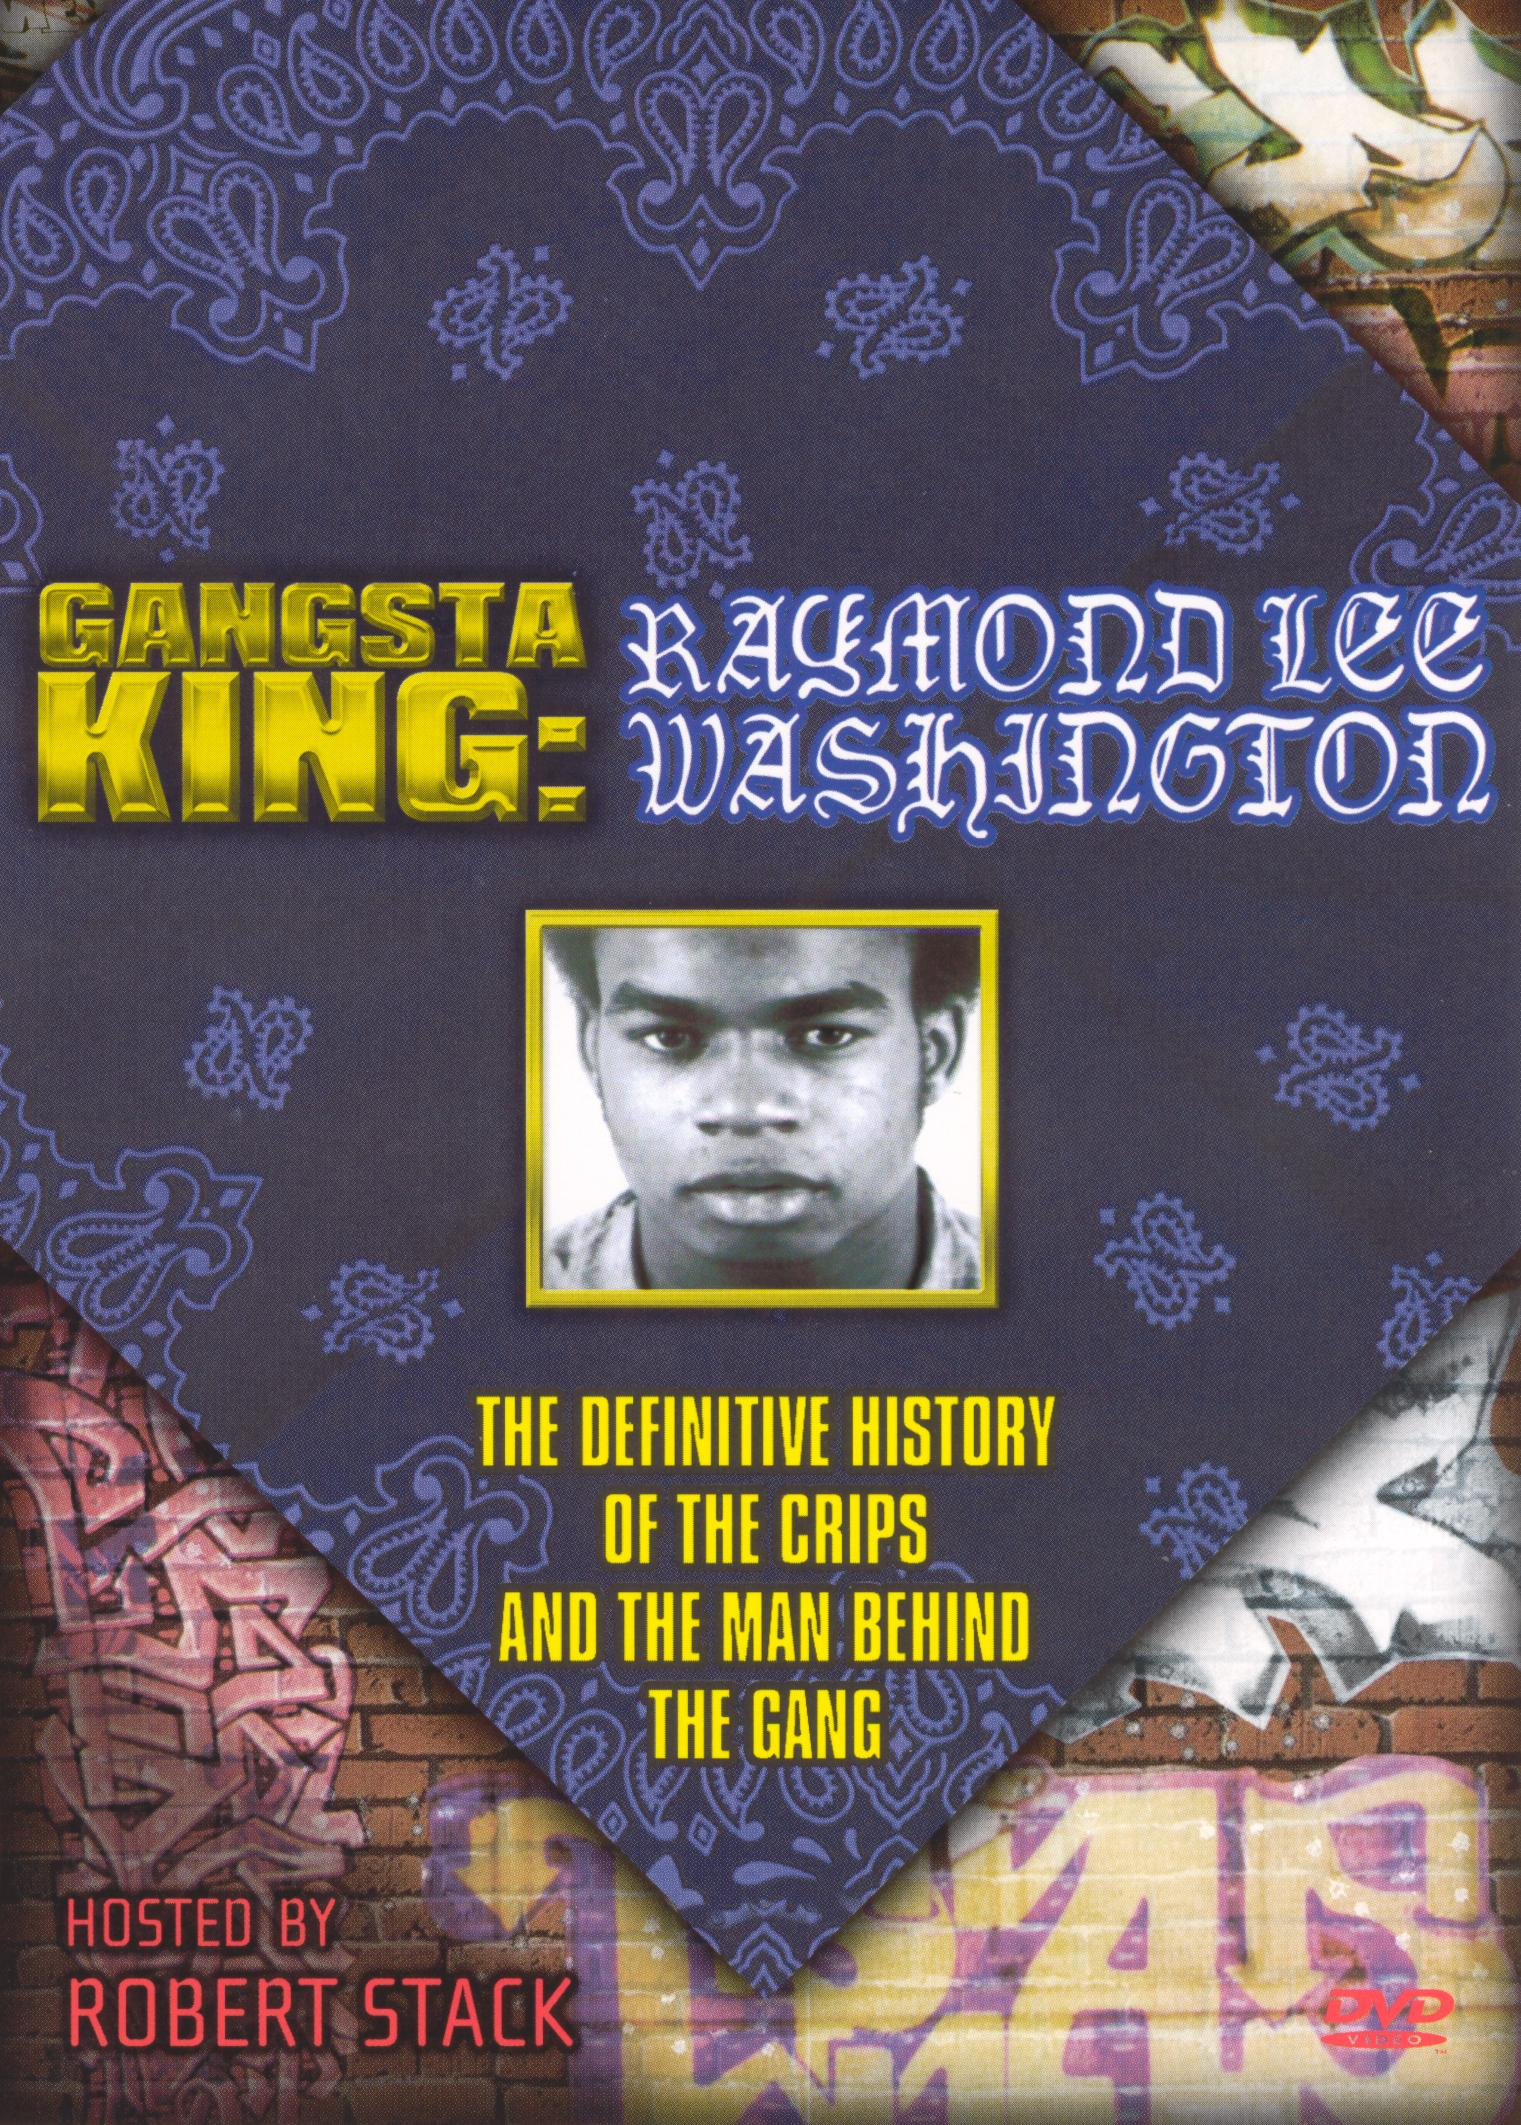 Gangsta King: Raymond Lee Washington